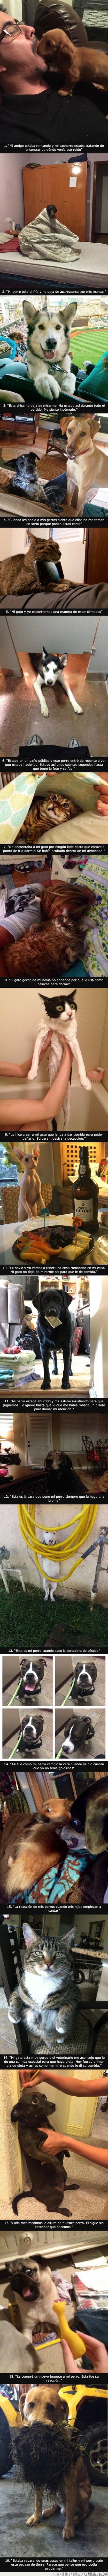 entender,gatos,mascotas,perros